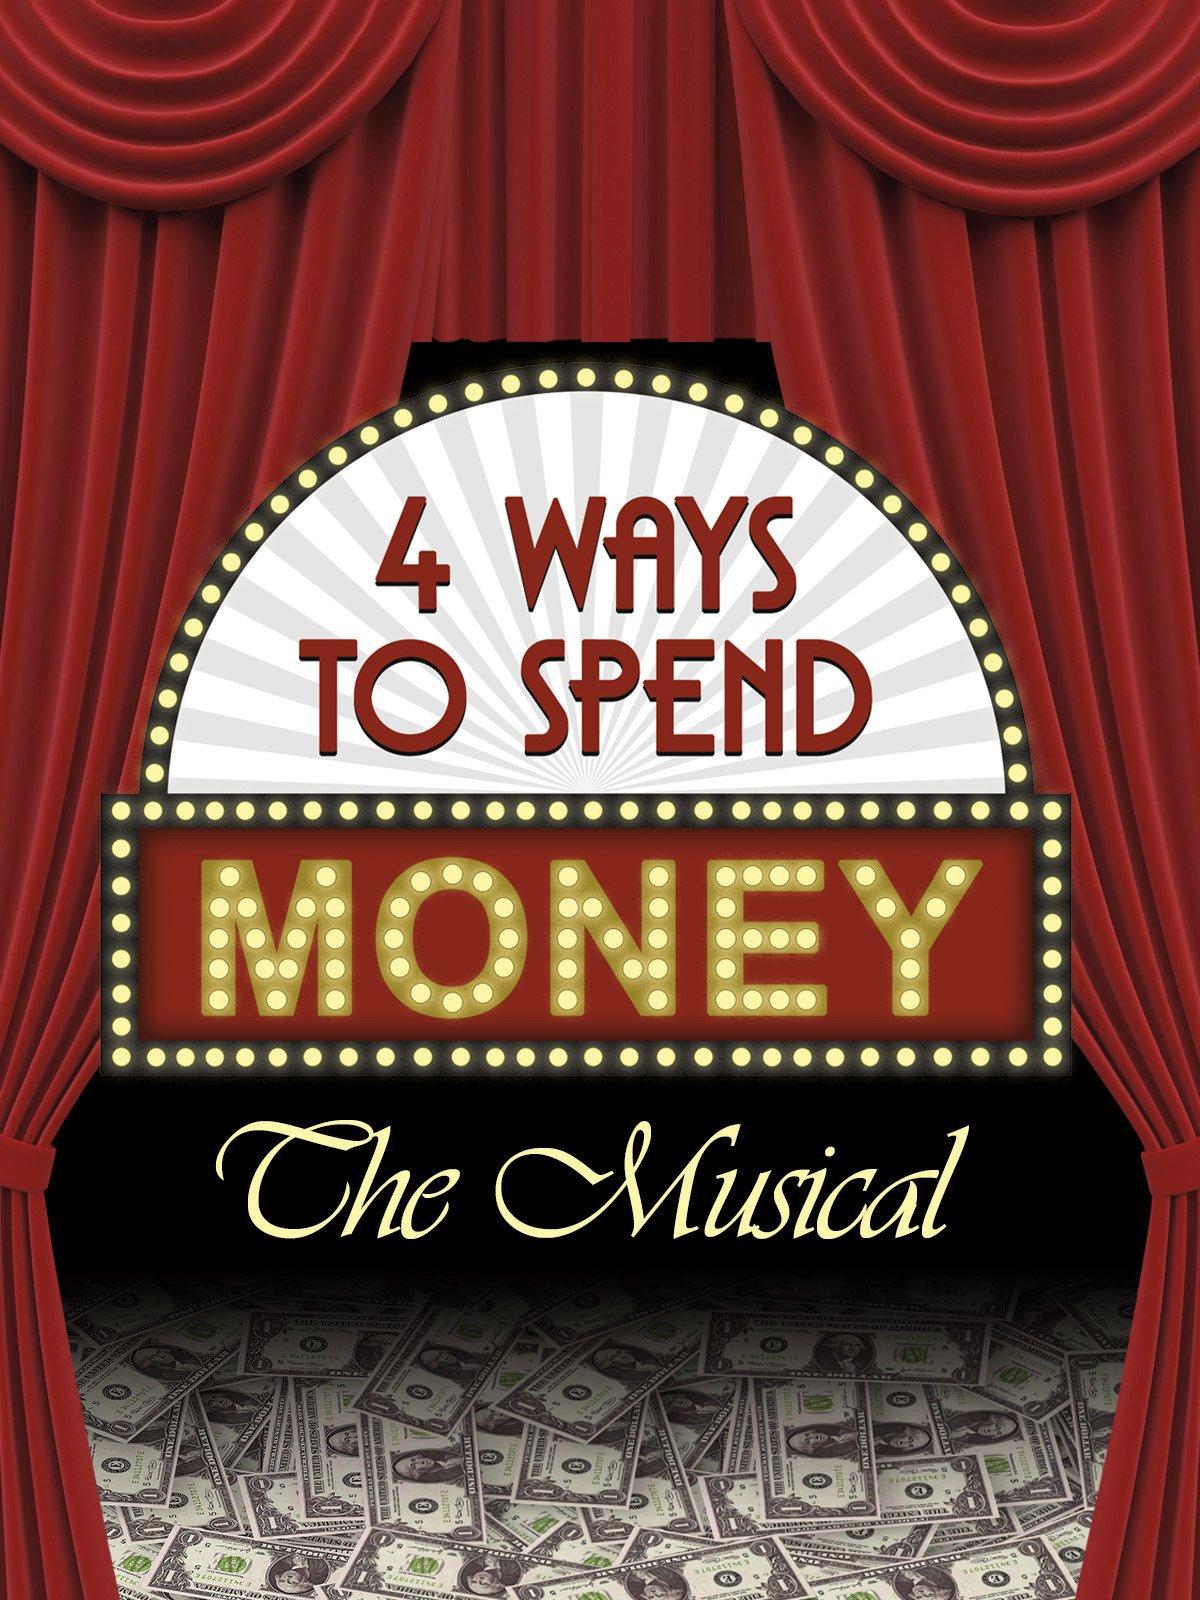 4 Ways to Spend Money